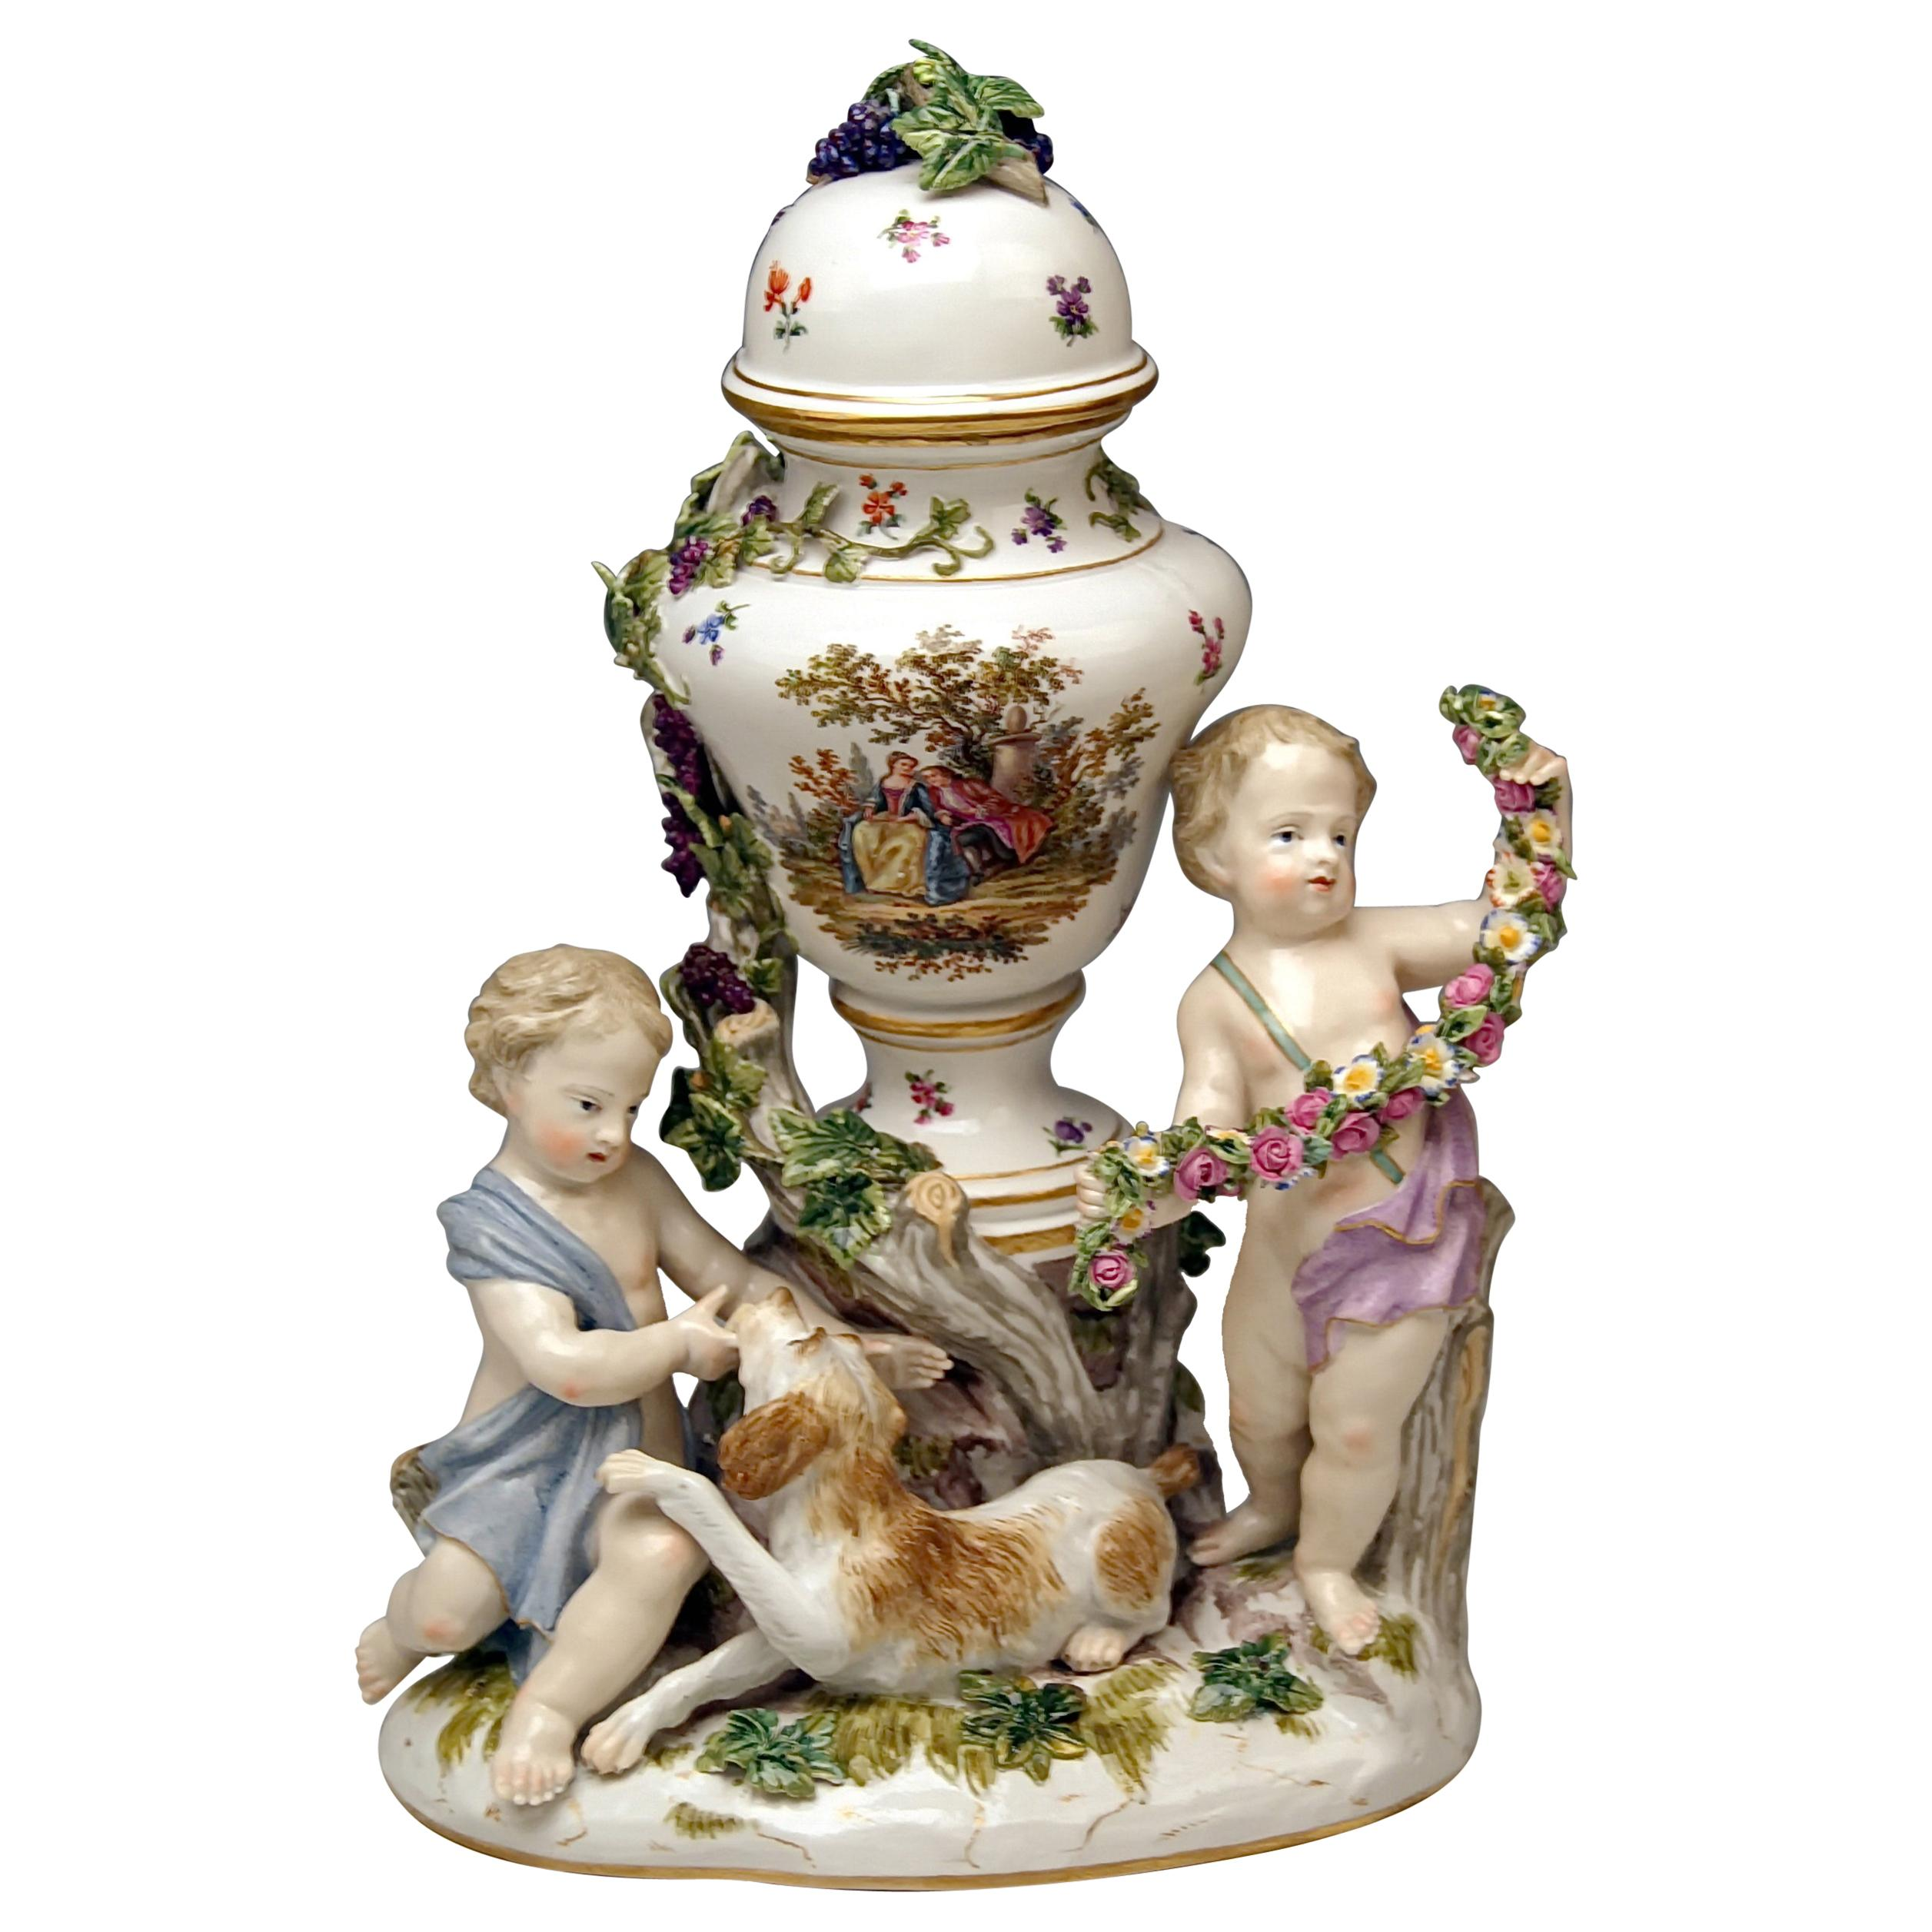 Meissen Urn Vase with Two Cherubs by Kaendler Model 1009 Made circa 1830-1840